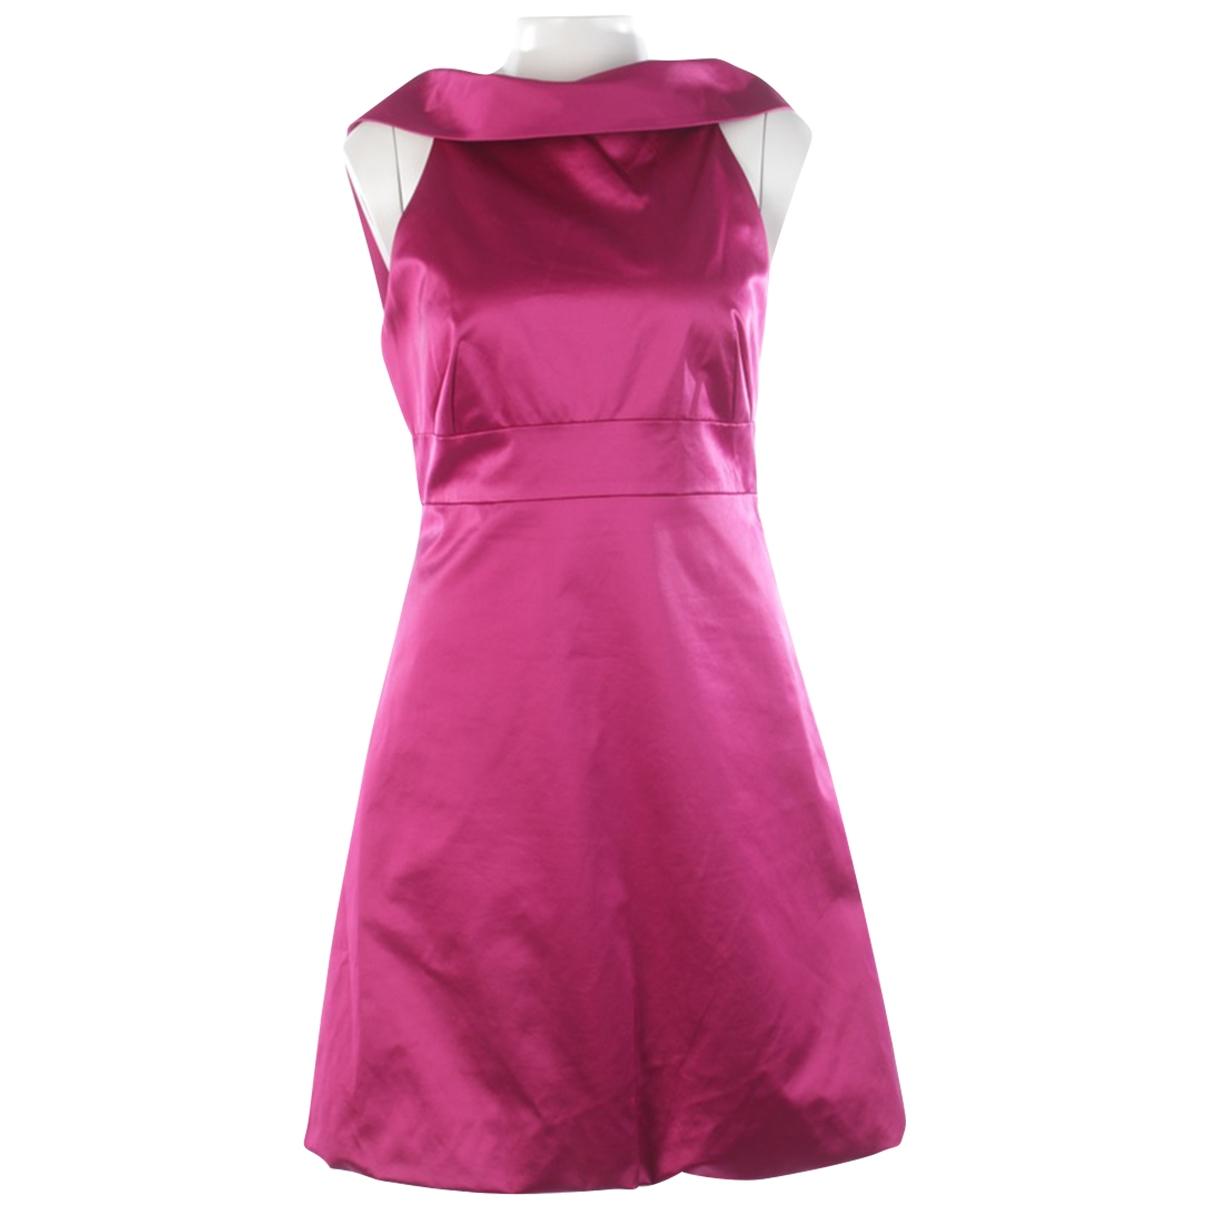 Karen Millen \N Kleid in  Lila Baumwolle